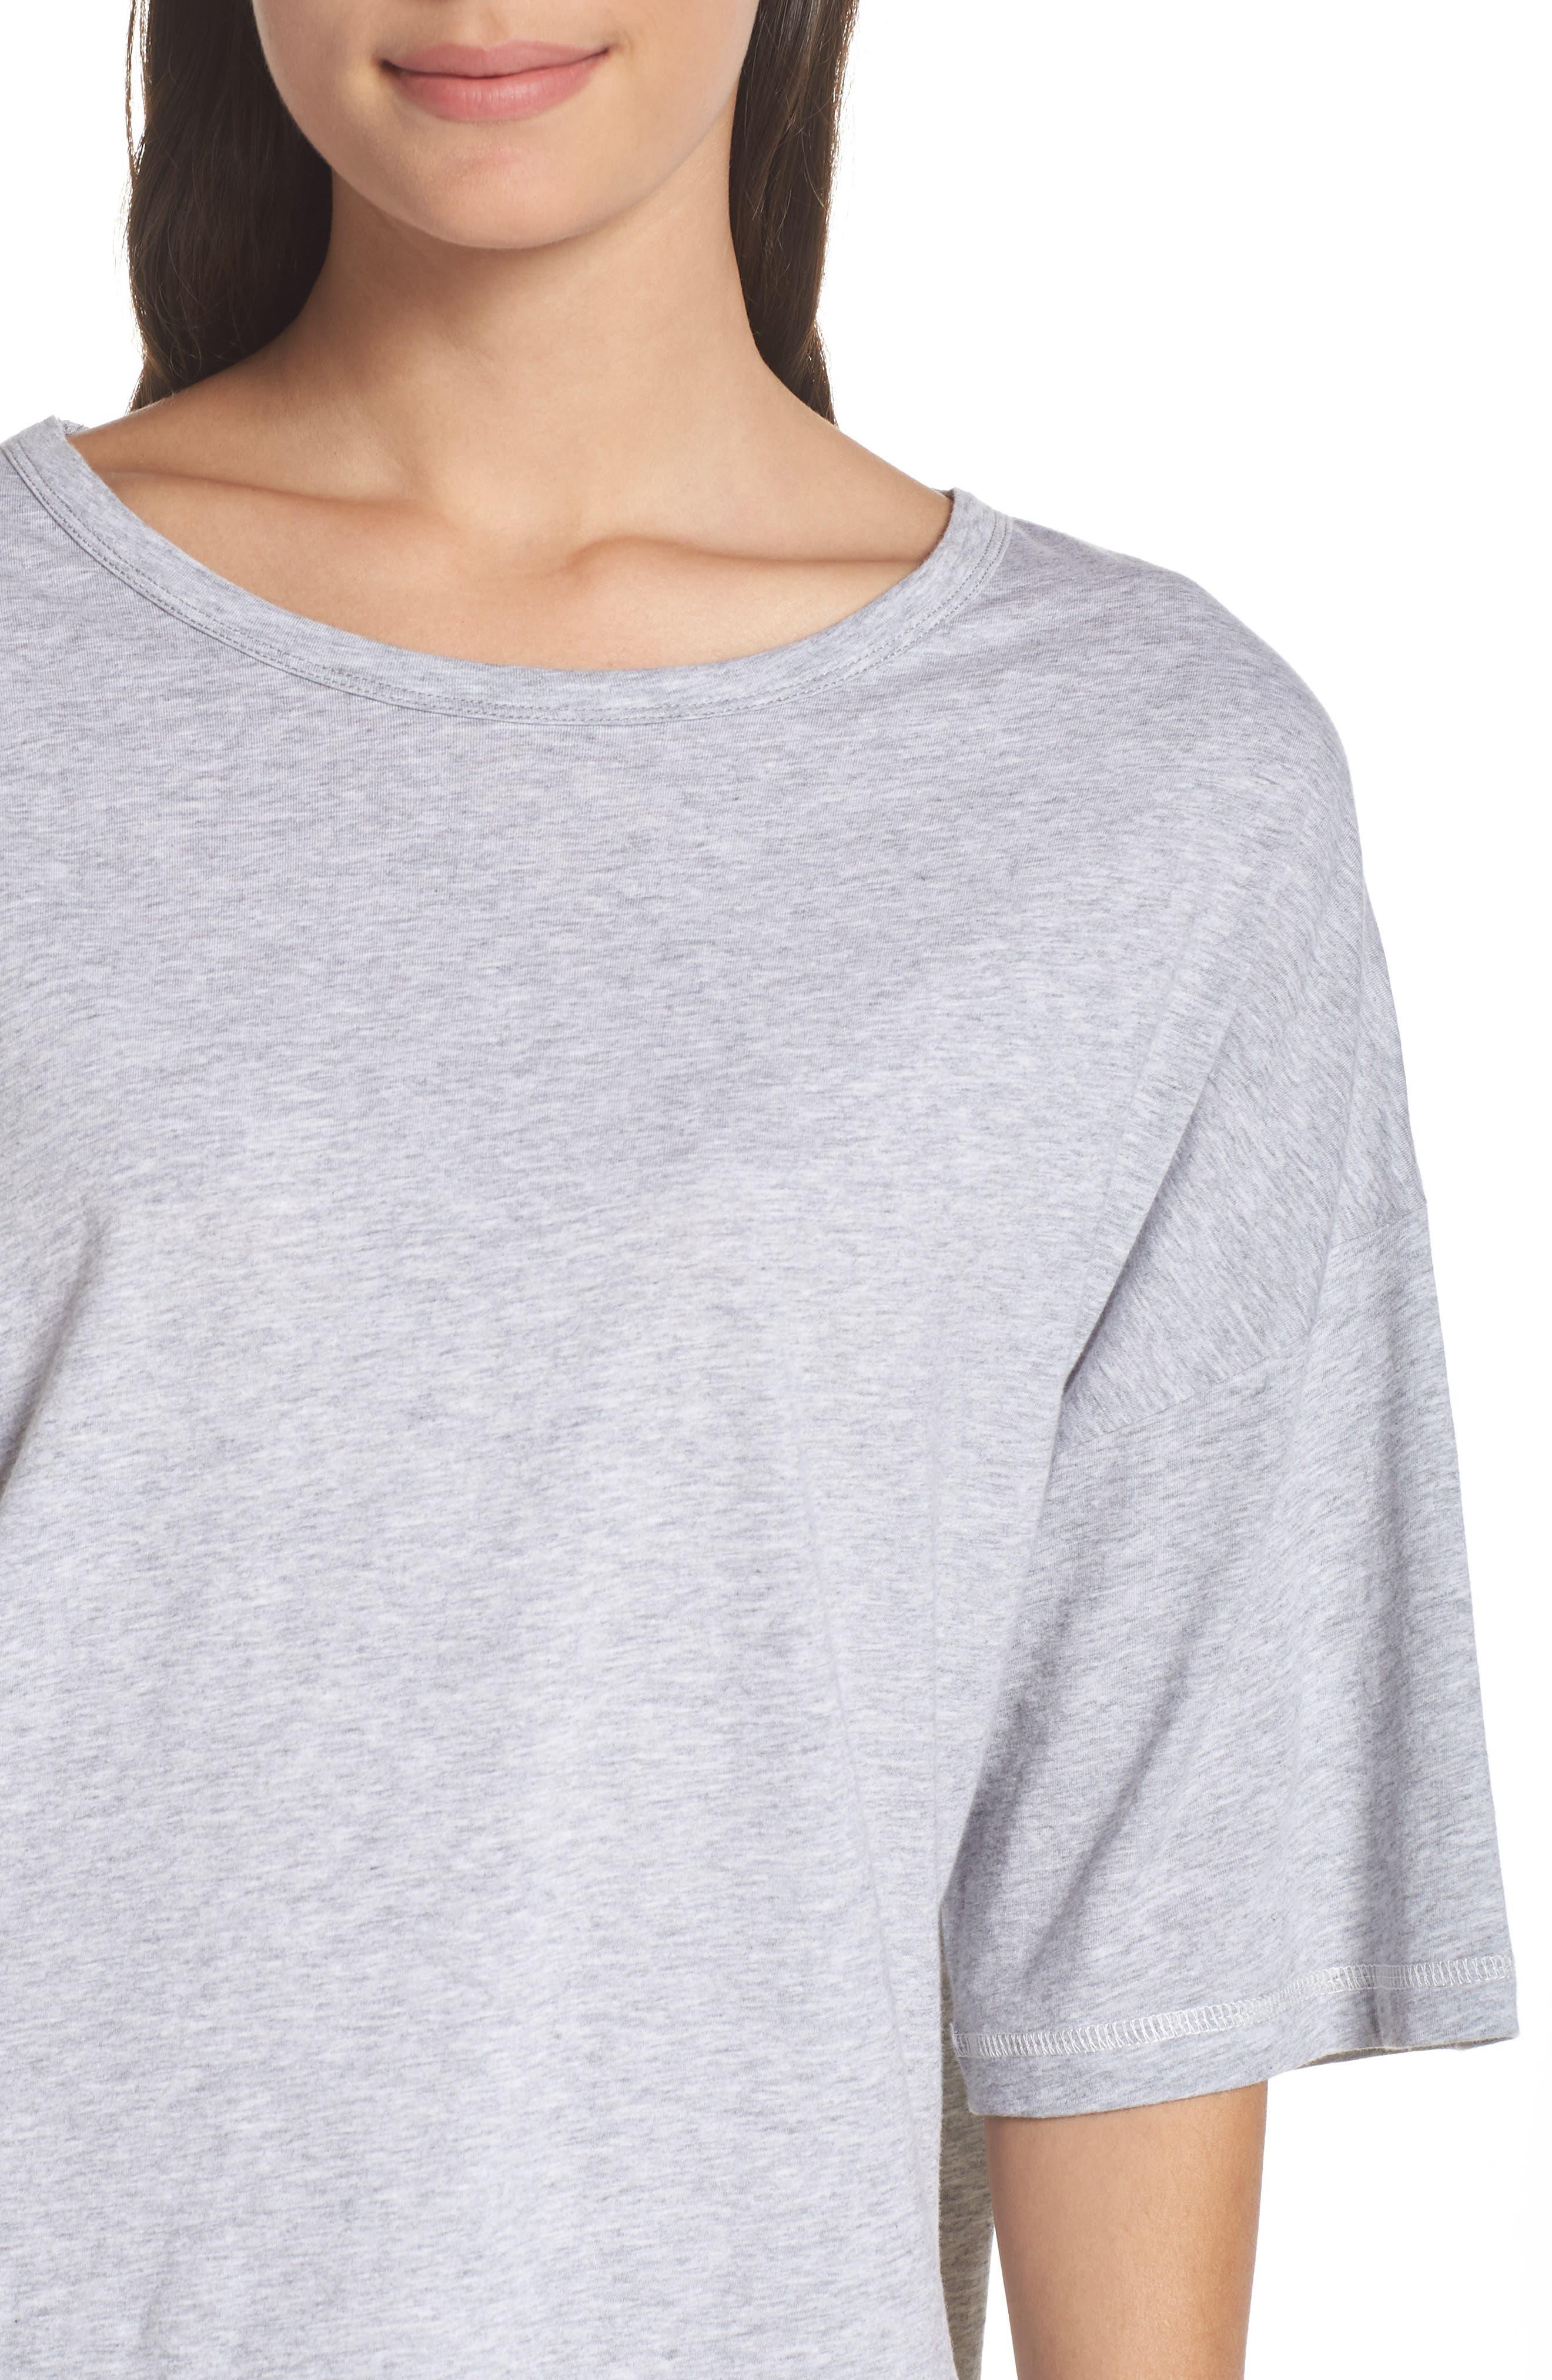 Soph Lounge Shirt,                             Alternate thumbnail 4, color,                             SMOKE MARLE